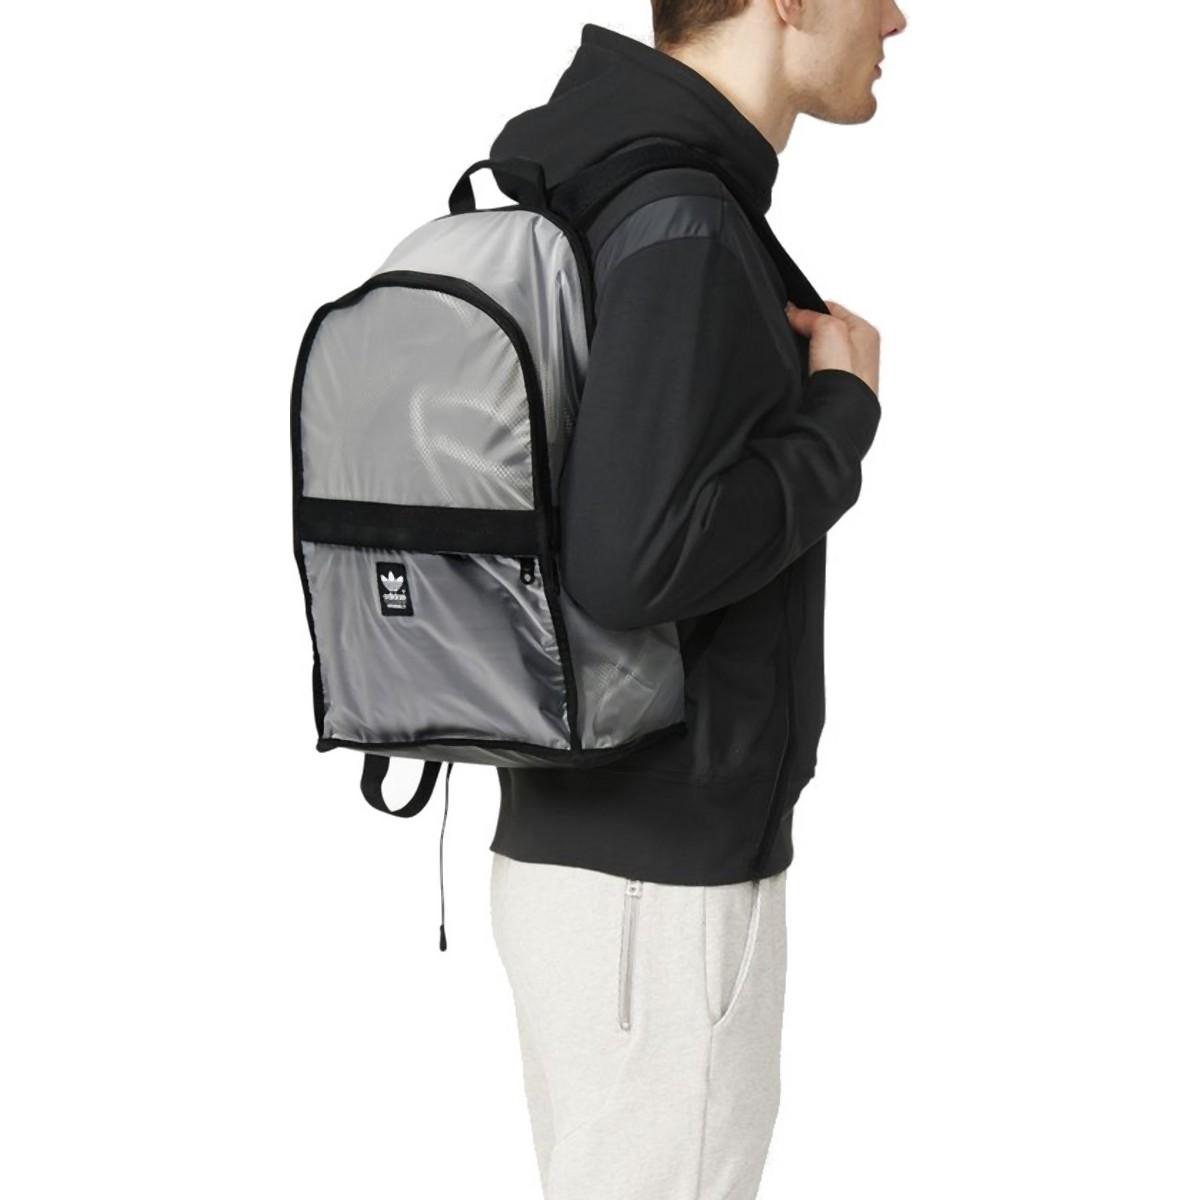 Plecak Adidas Basketball Aj8502 |